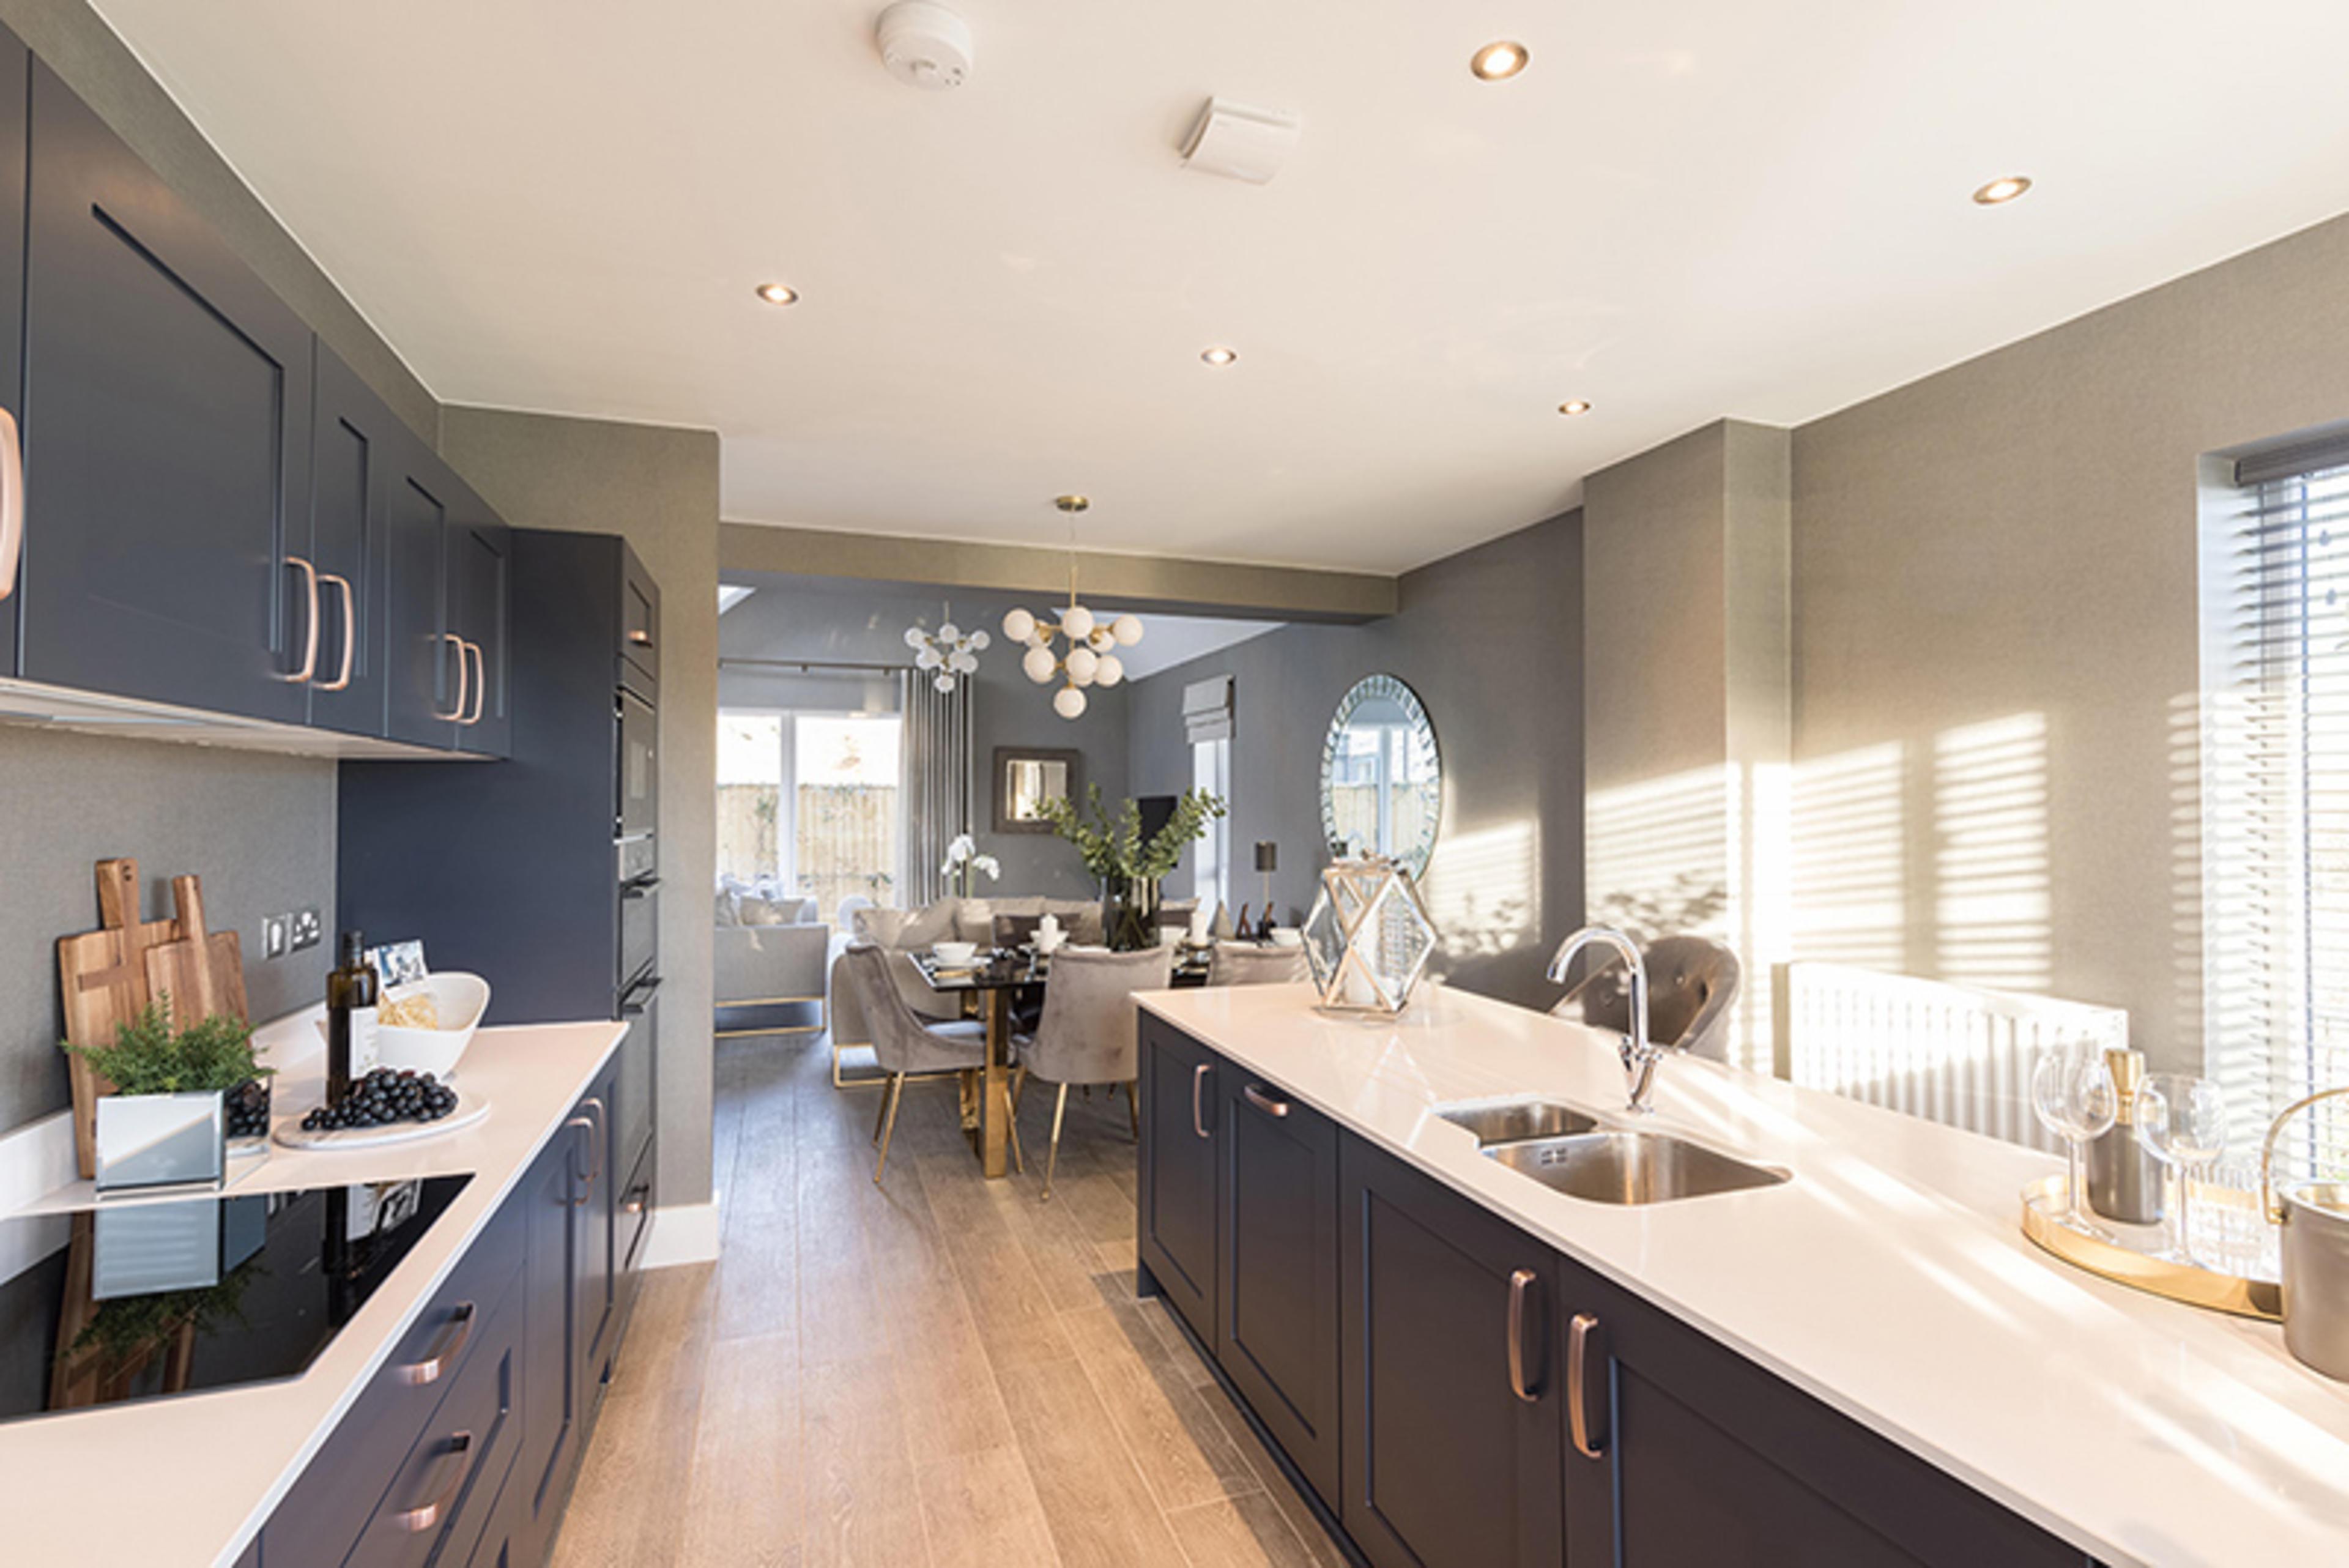 watling-grange-harrogate-merevale-4-bed-home-open-plan-view-1